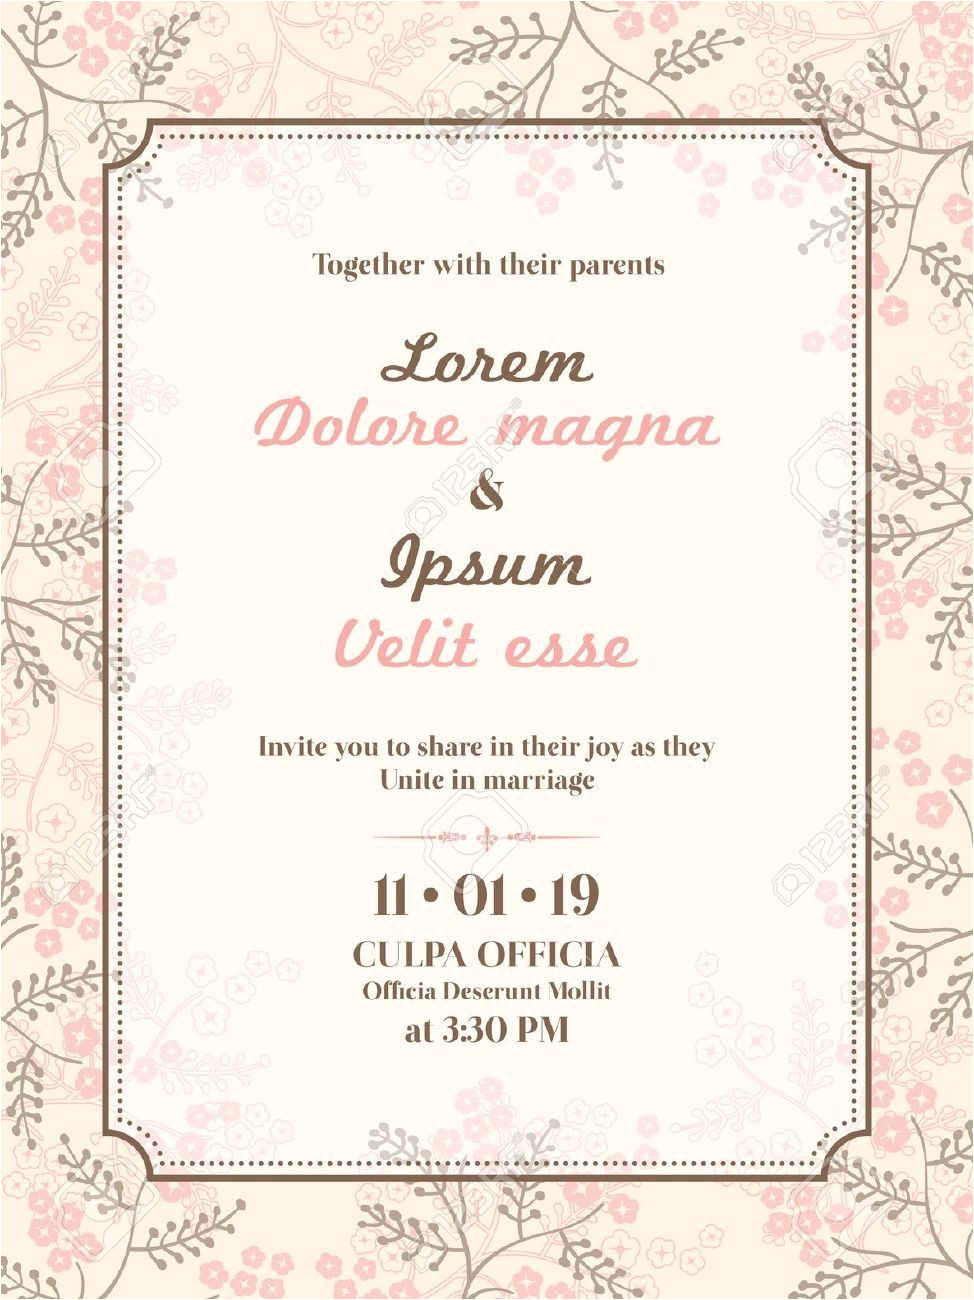 Marriage Invitation Card In English Marriage Invitation Cards Dengan Gambar